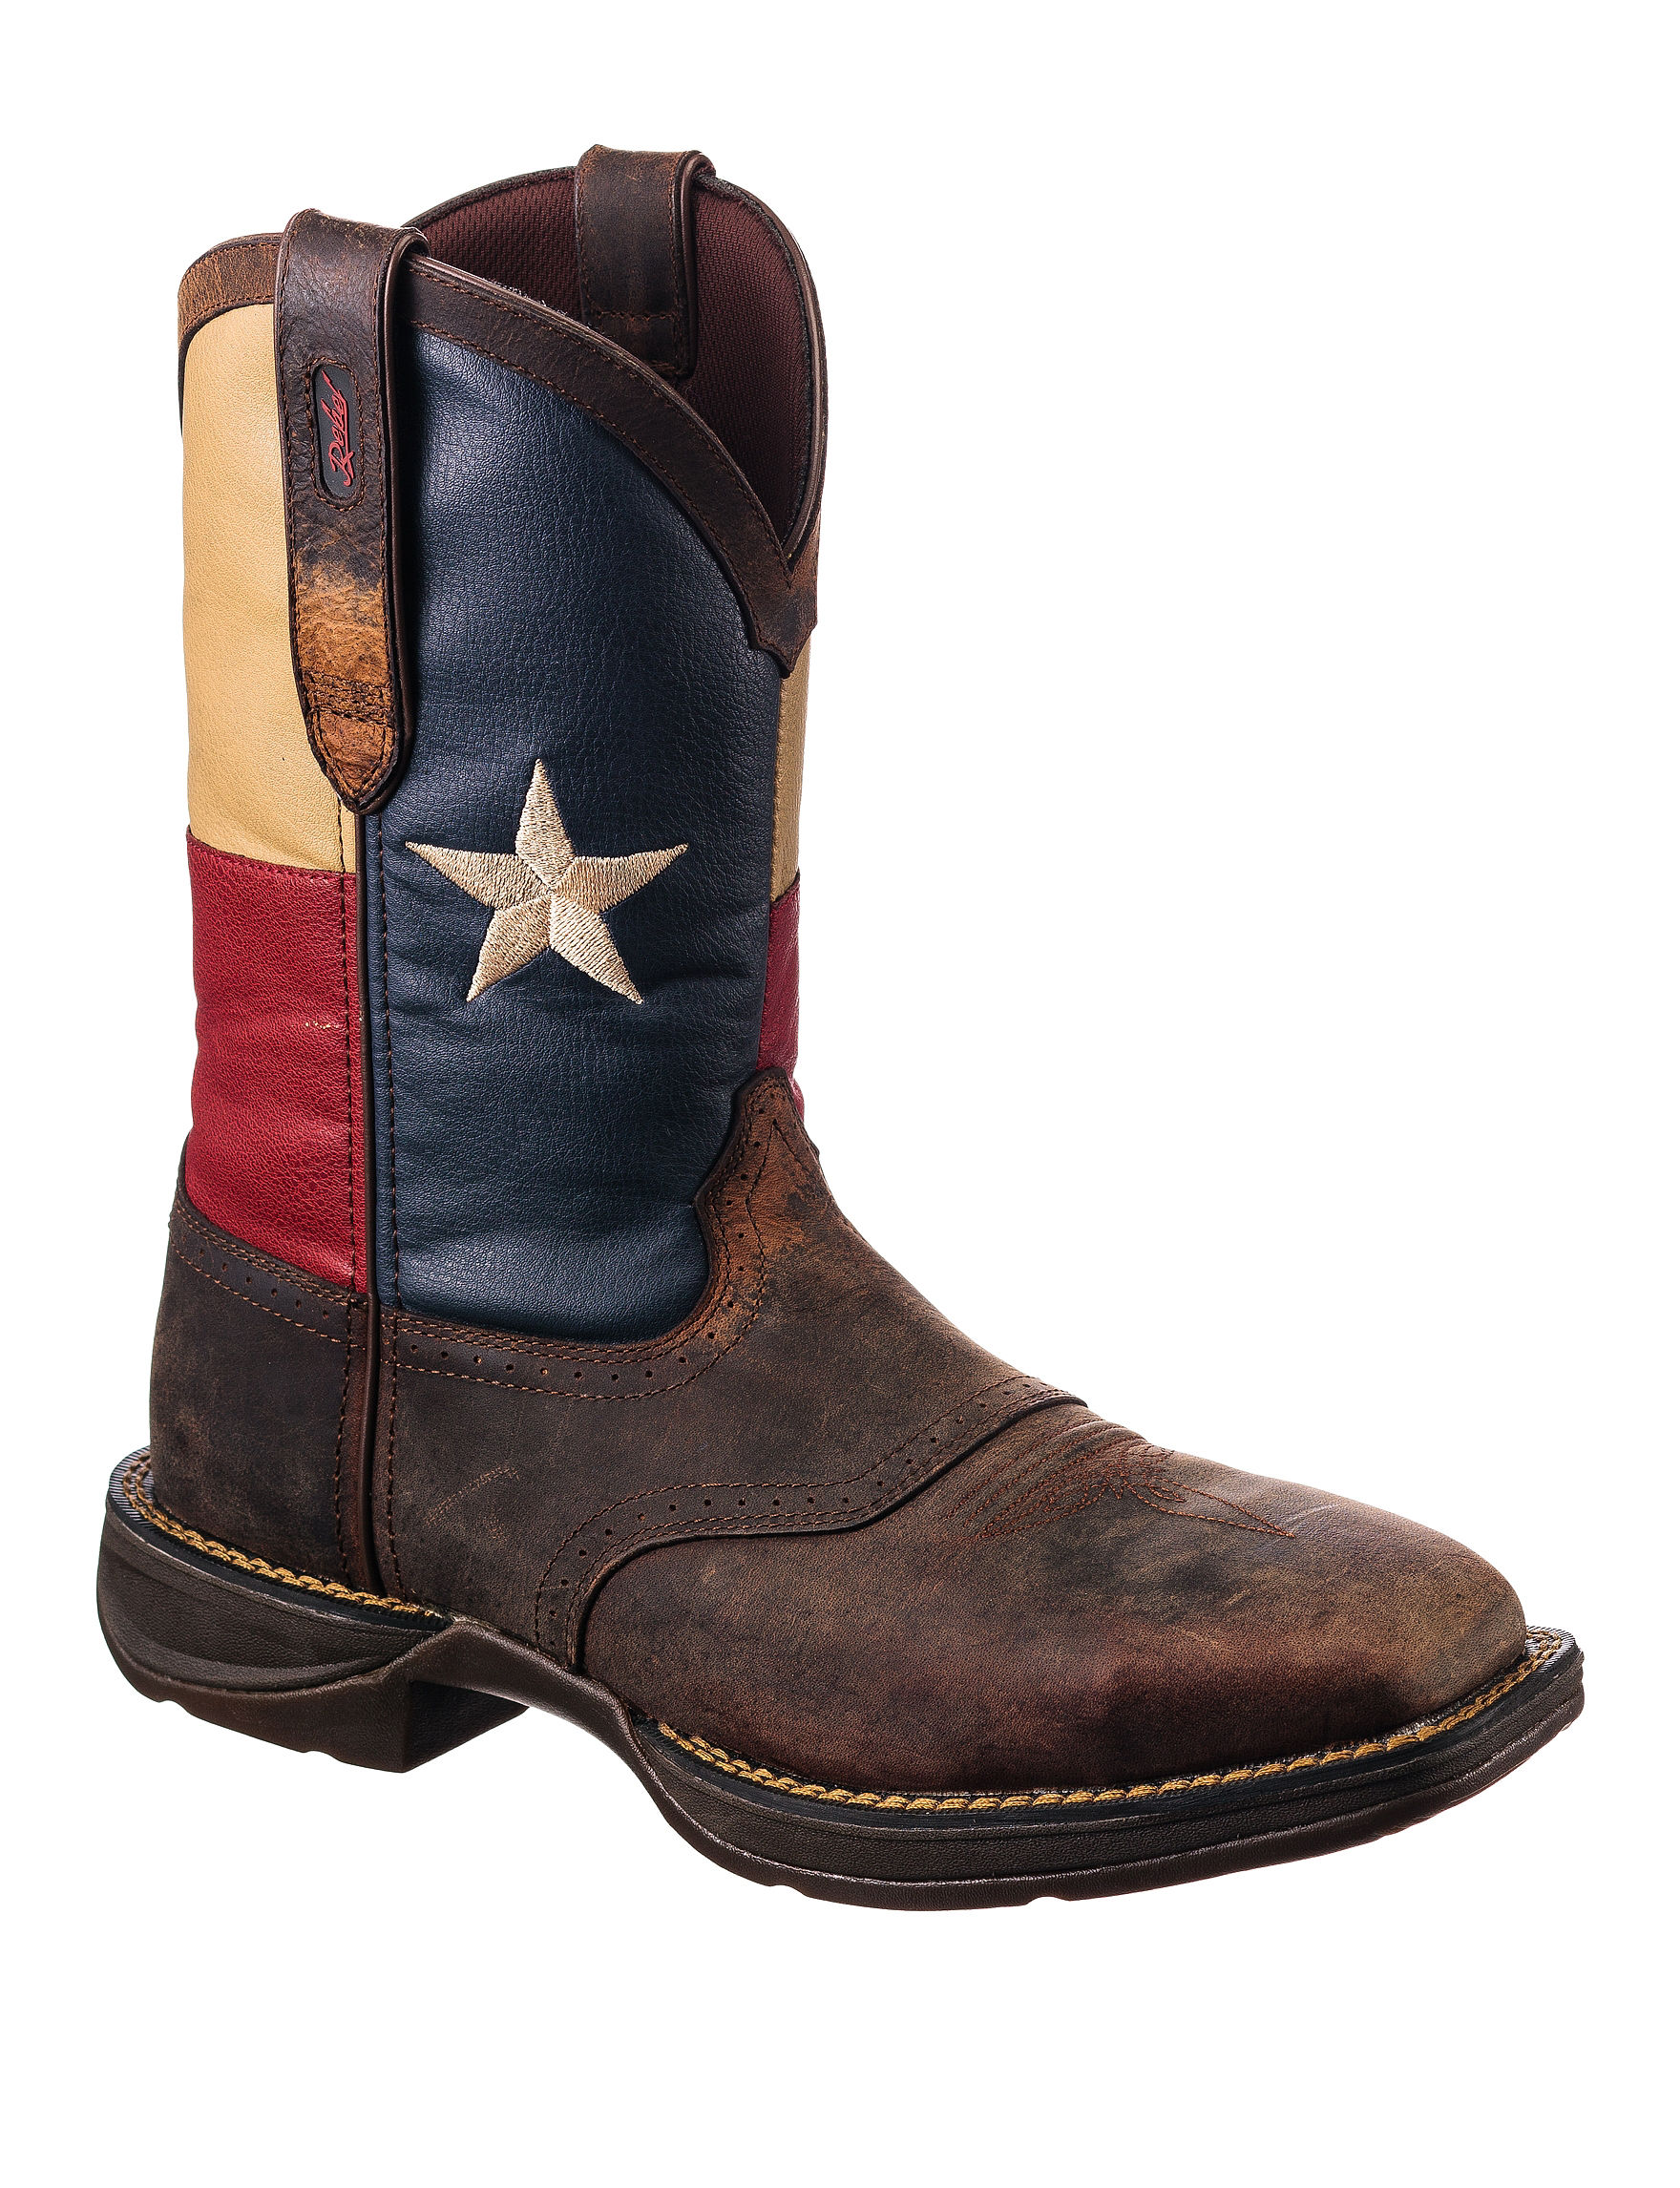 Durango Brown Western & Cowboy Boots